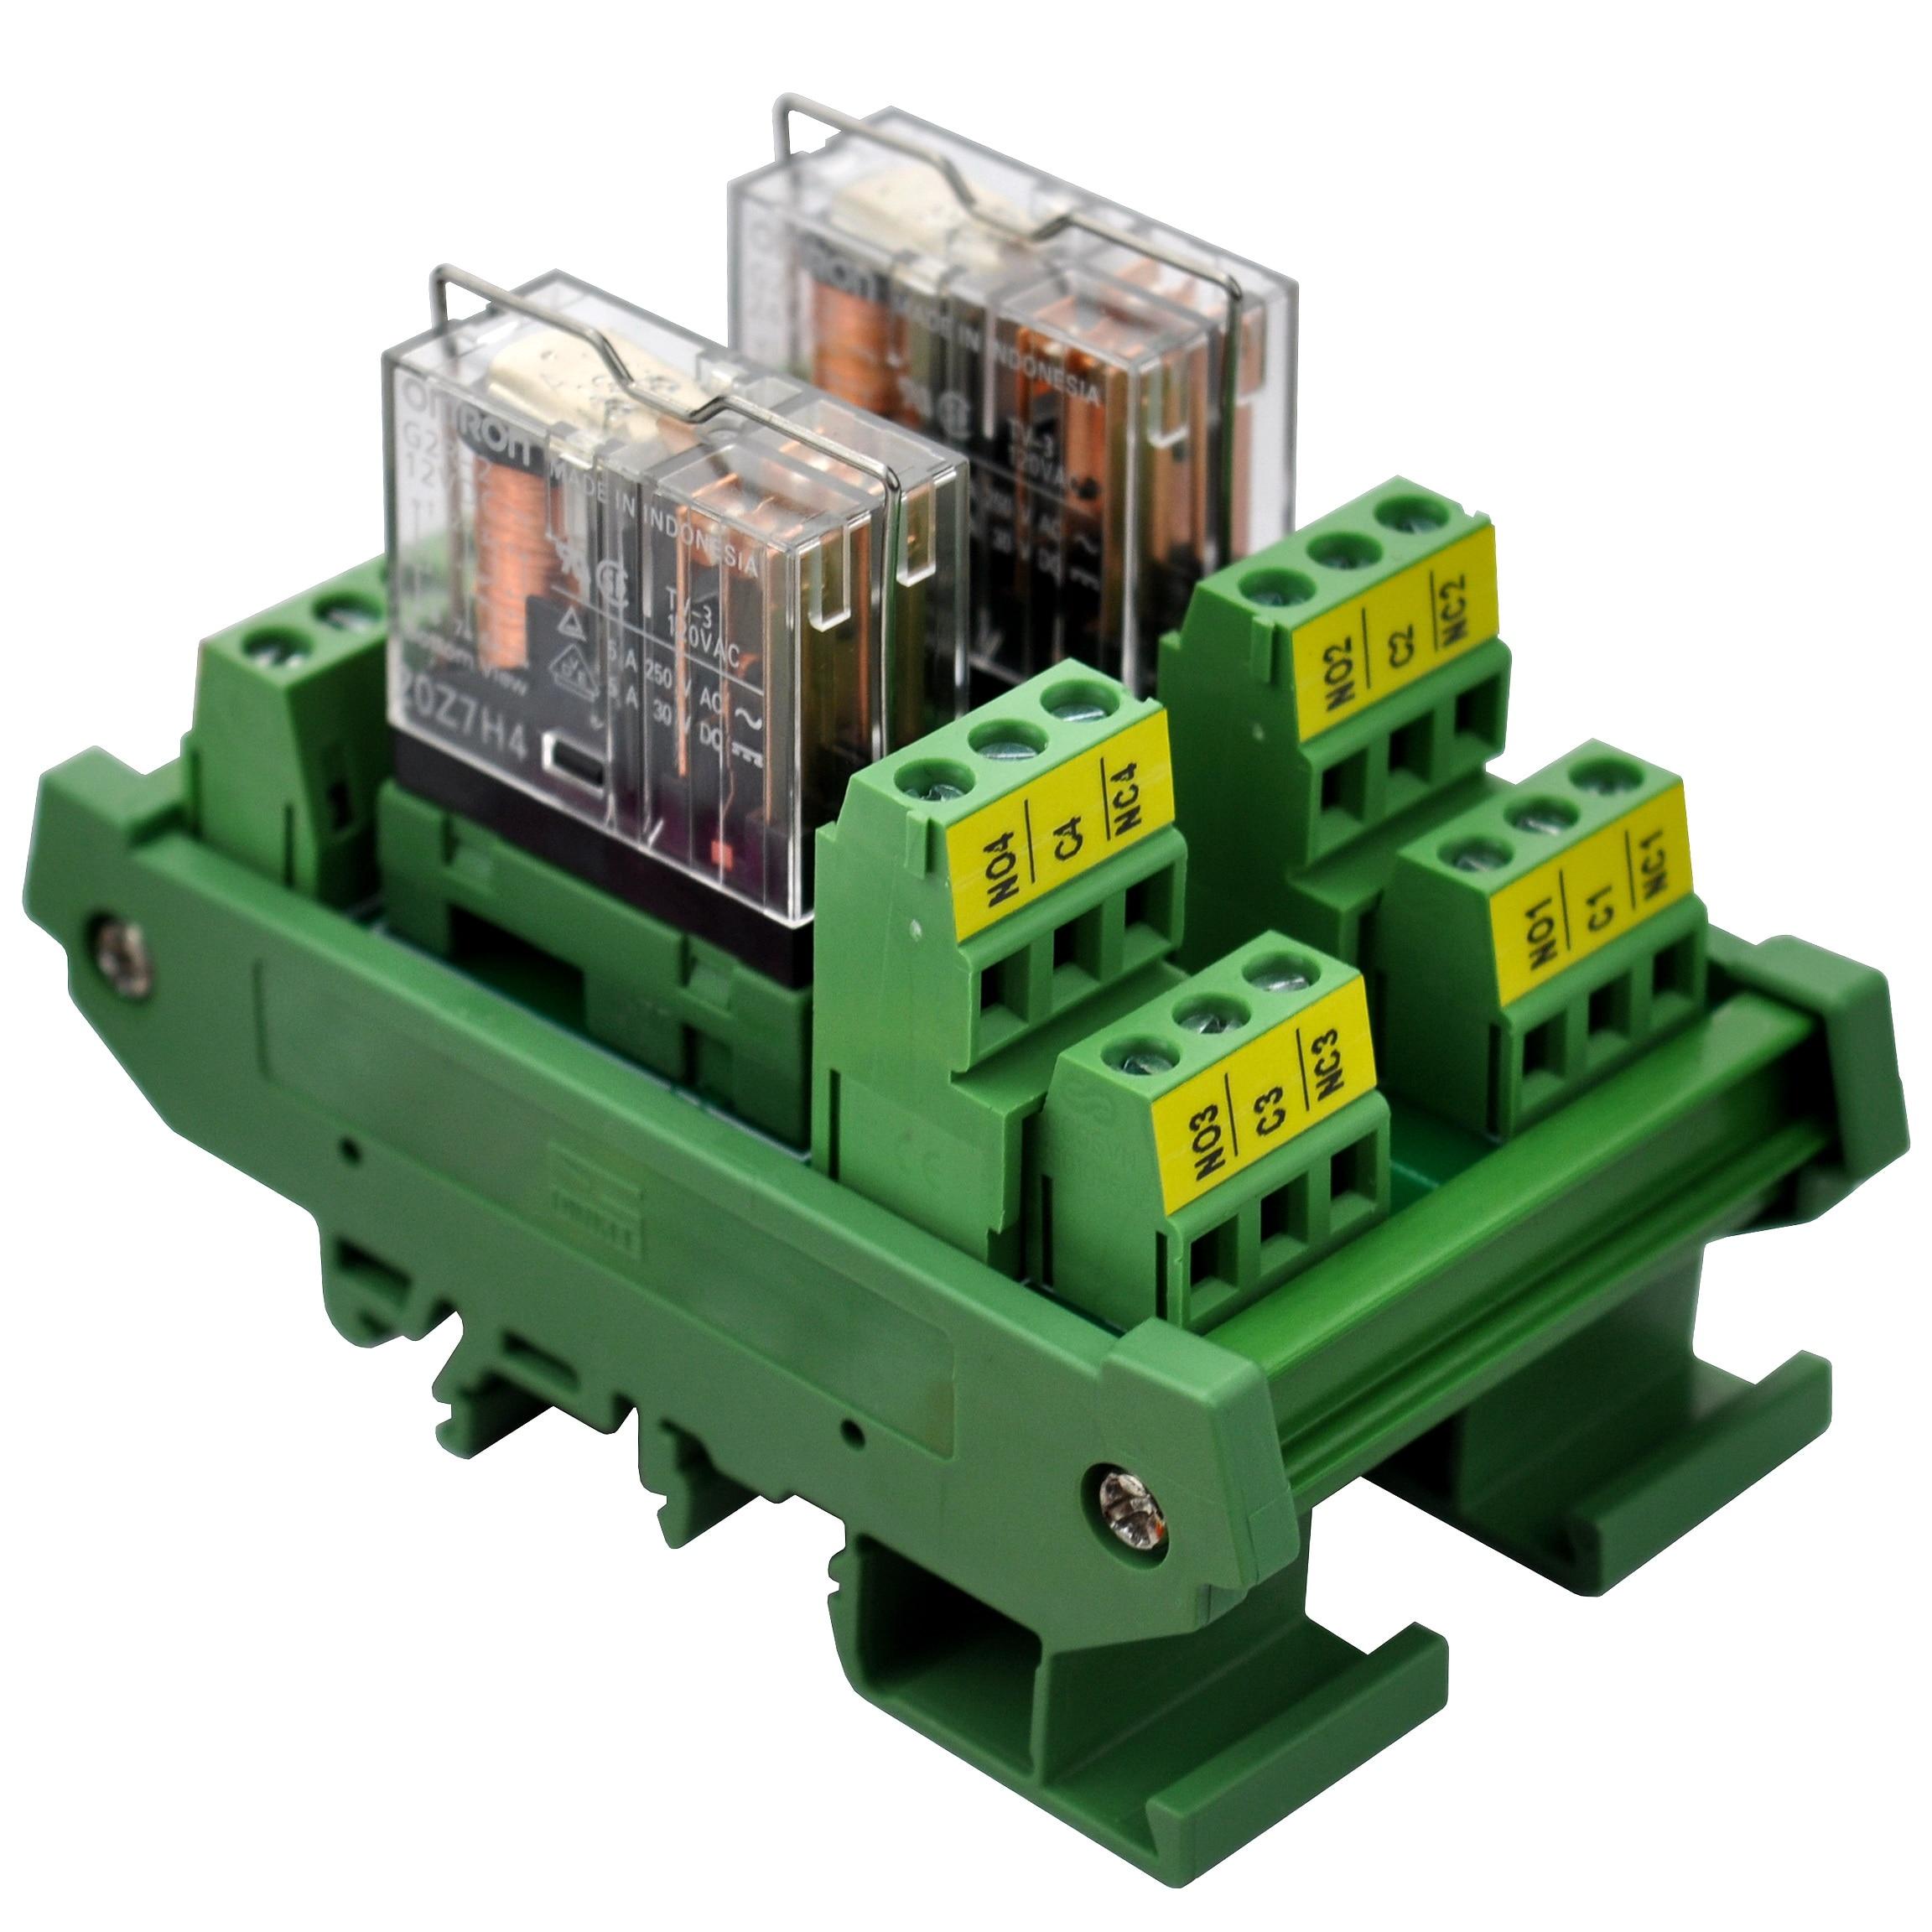 ELECTRONICS-SALON DIN Rail Mount AC/DC 12V Control 2 DPDT 5Amp Pluggable Power Relay Interface Module.